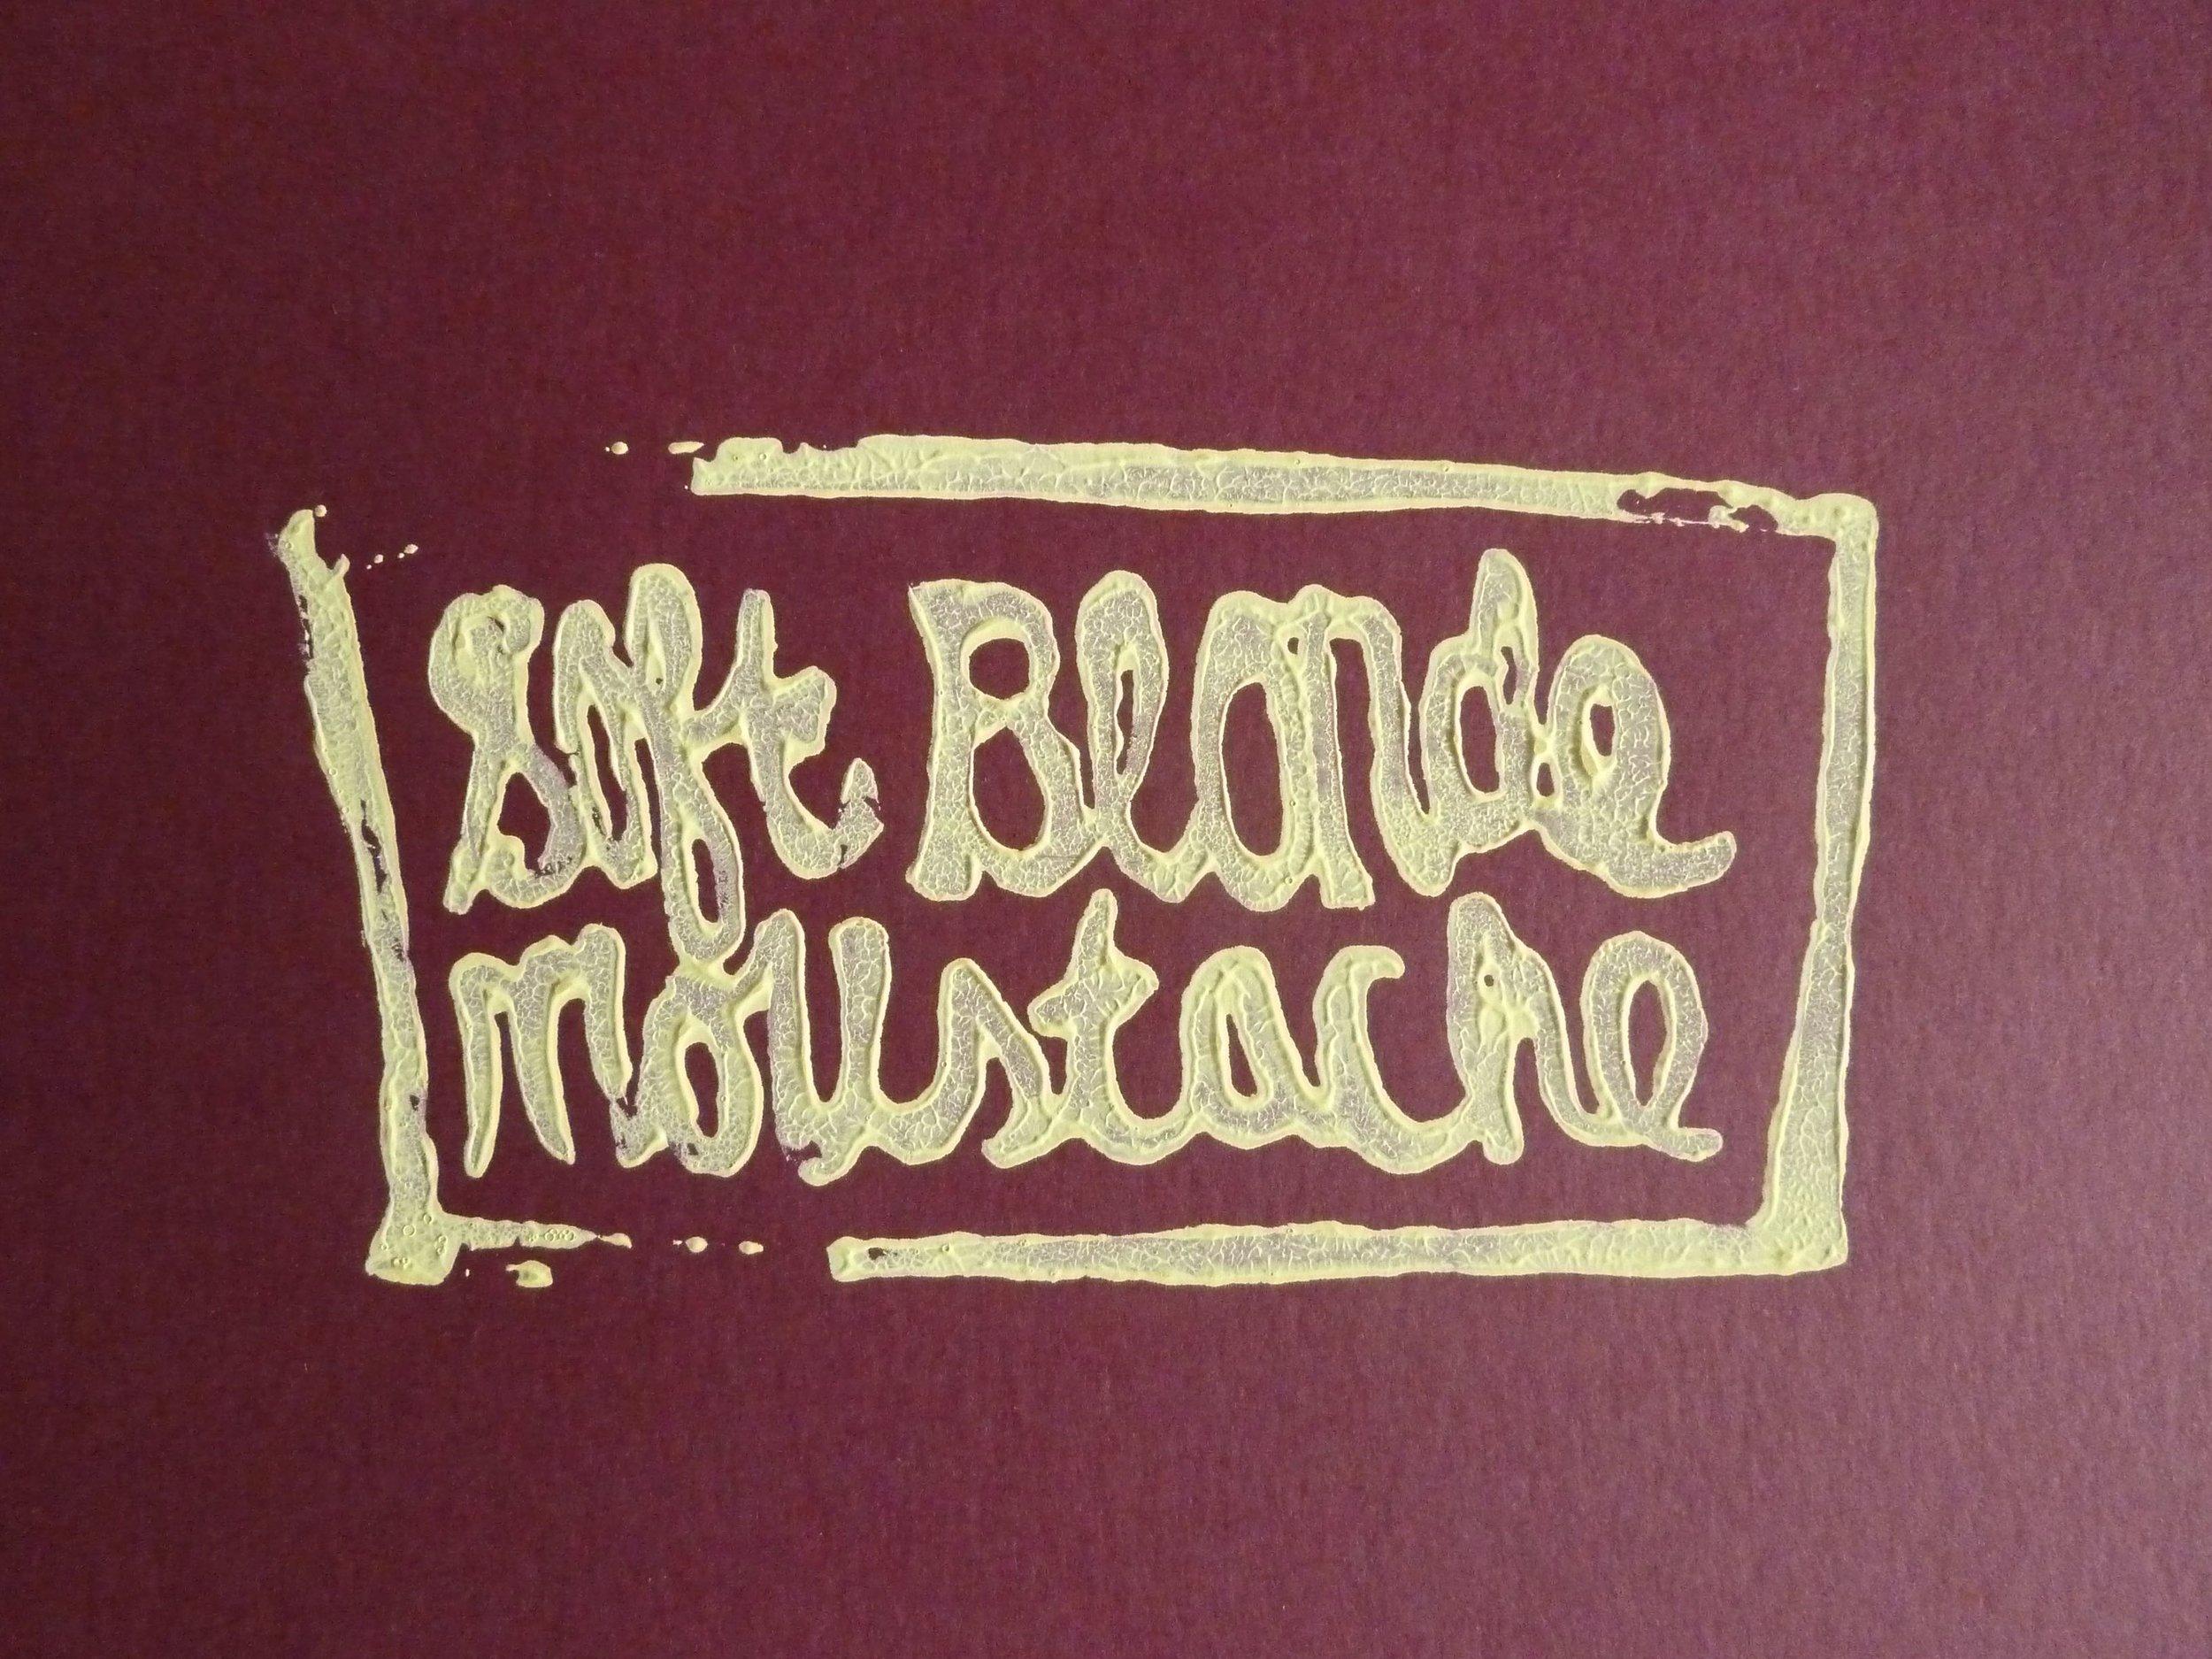 Soft Blonde Moustache book cover, 2008.